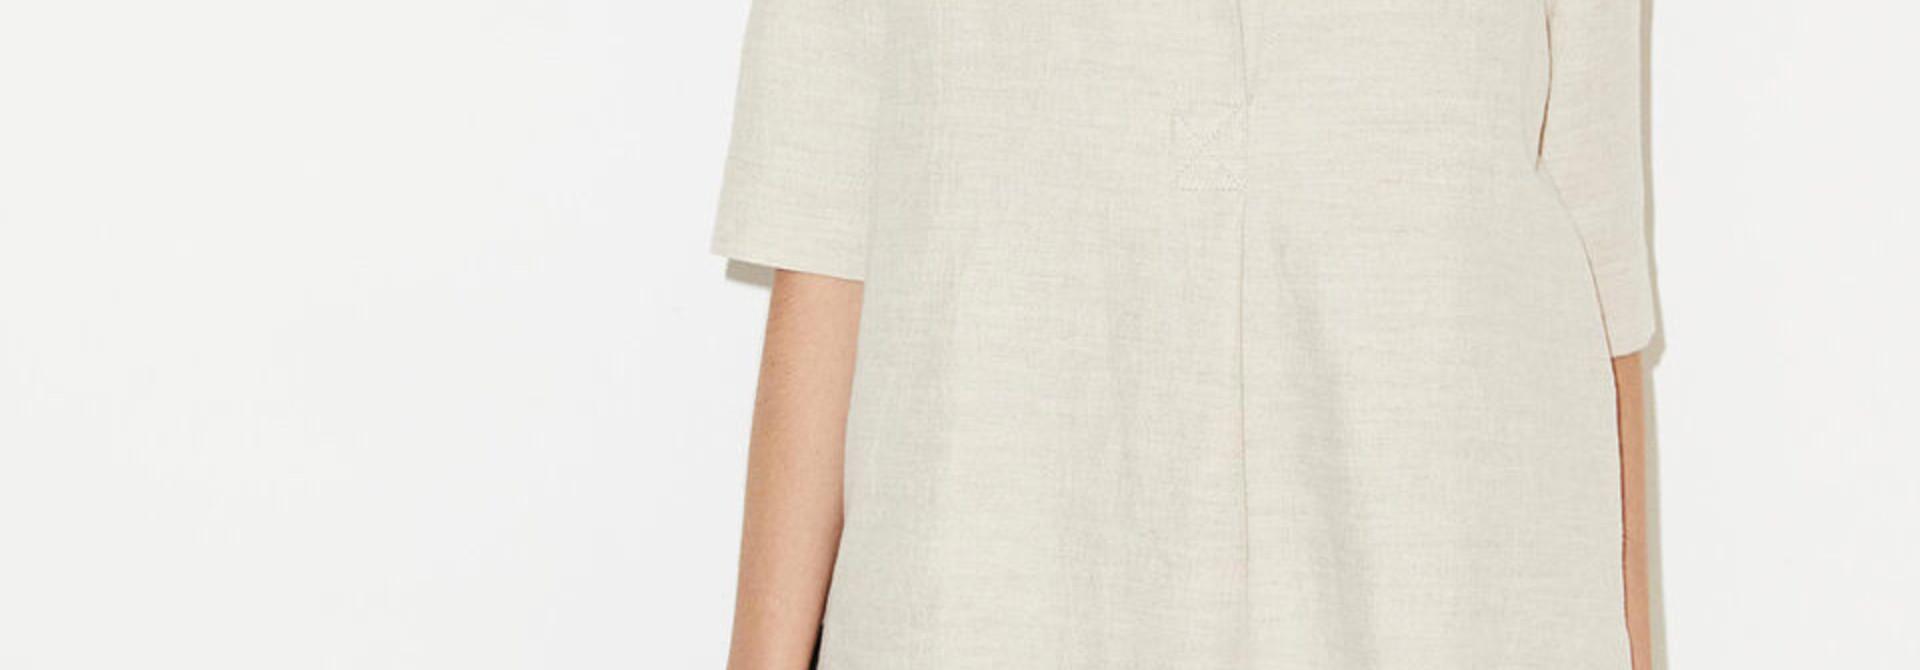 Gustavsson dress by malene birger